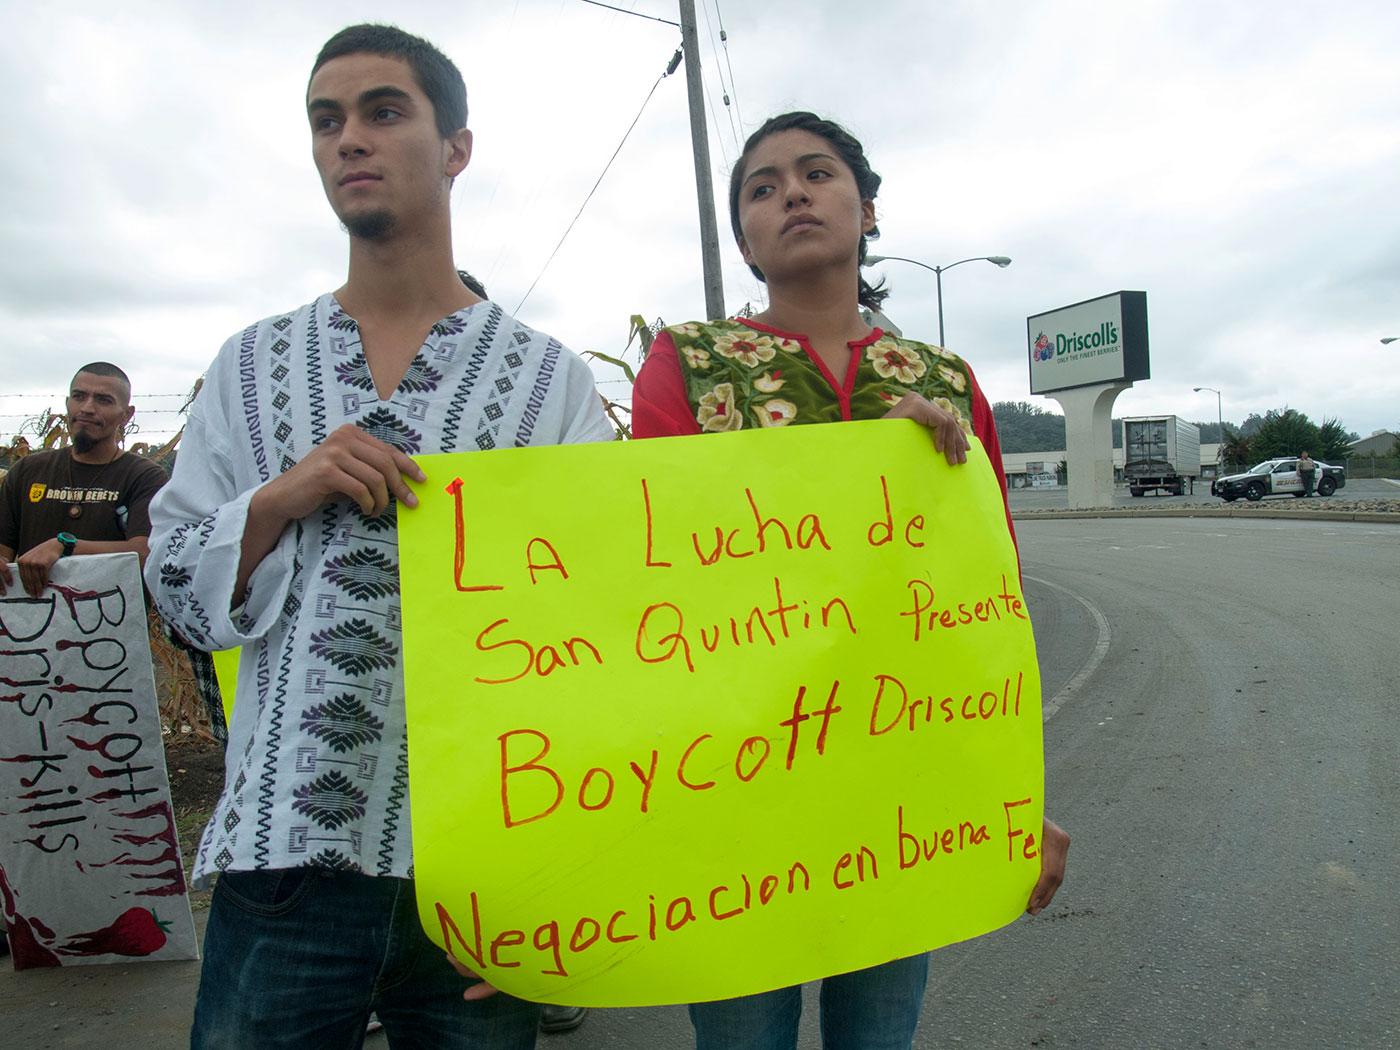 boycott-driscolls-protest-lucha